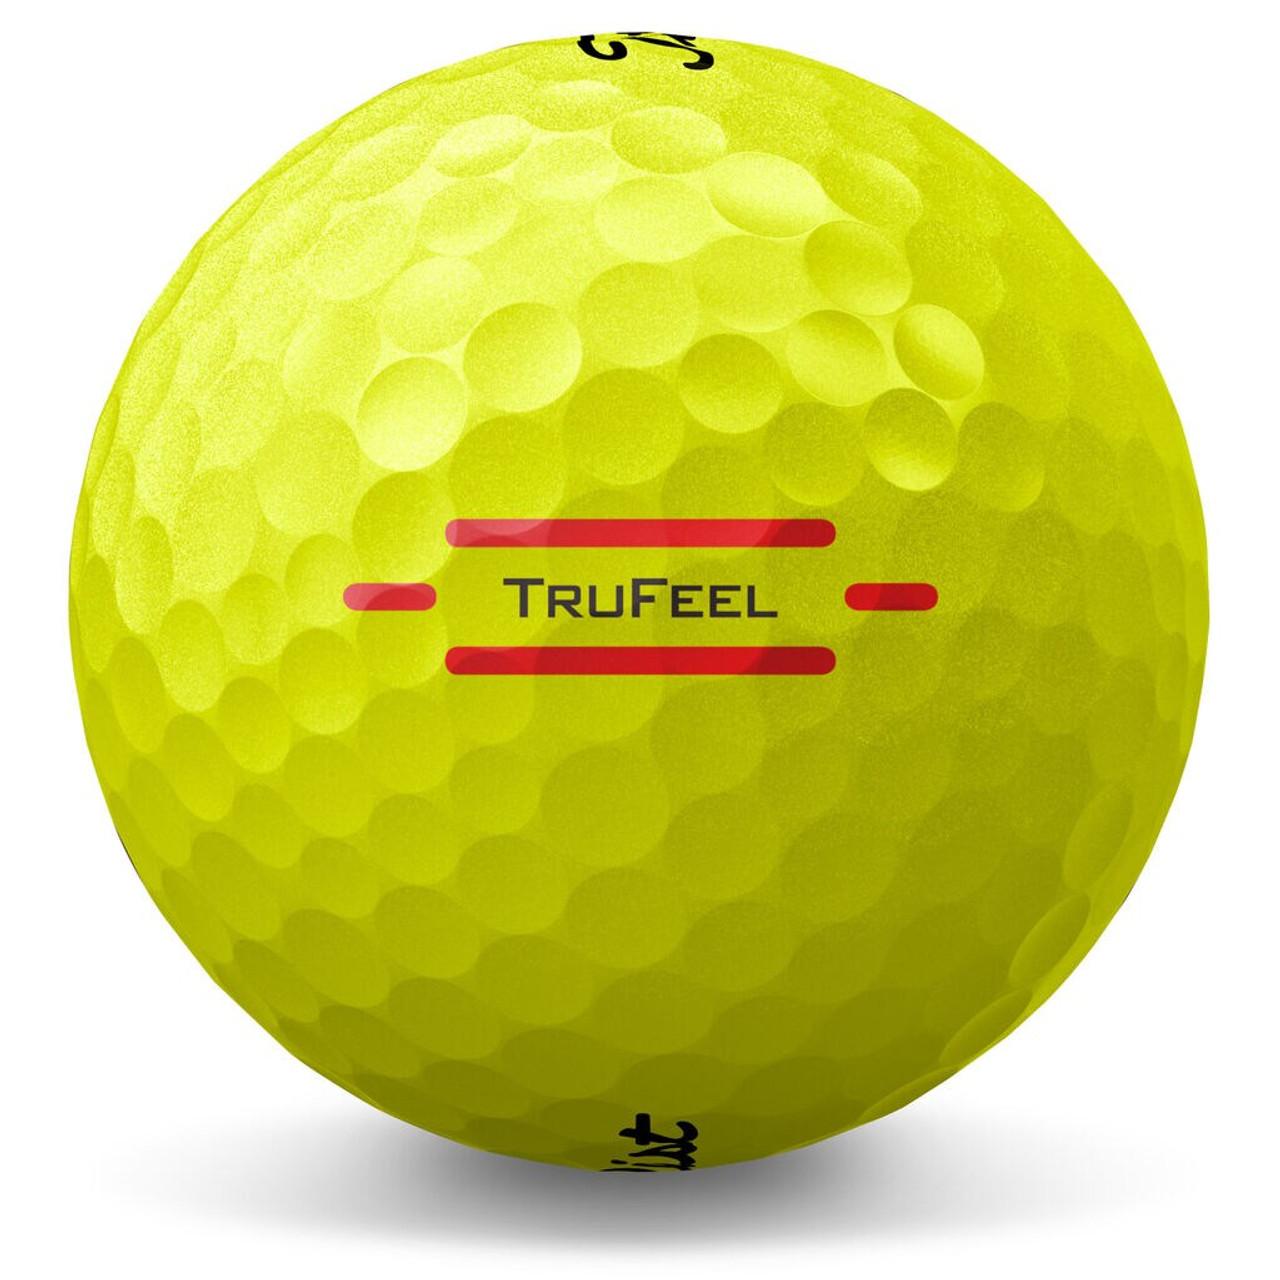 Titleist TruFeel Dozen Golf Balls - Yellow